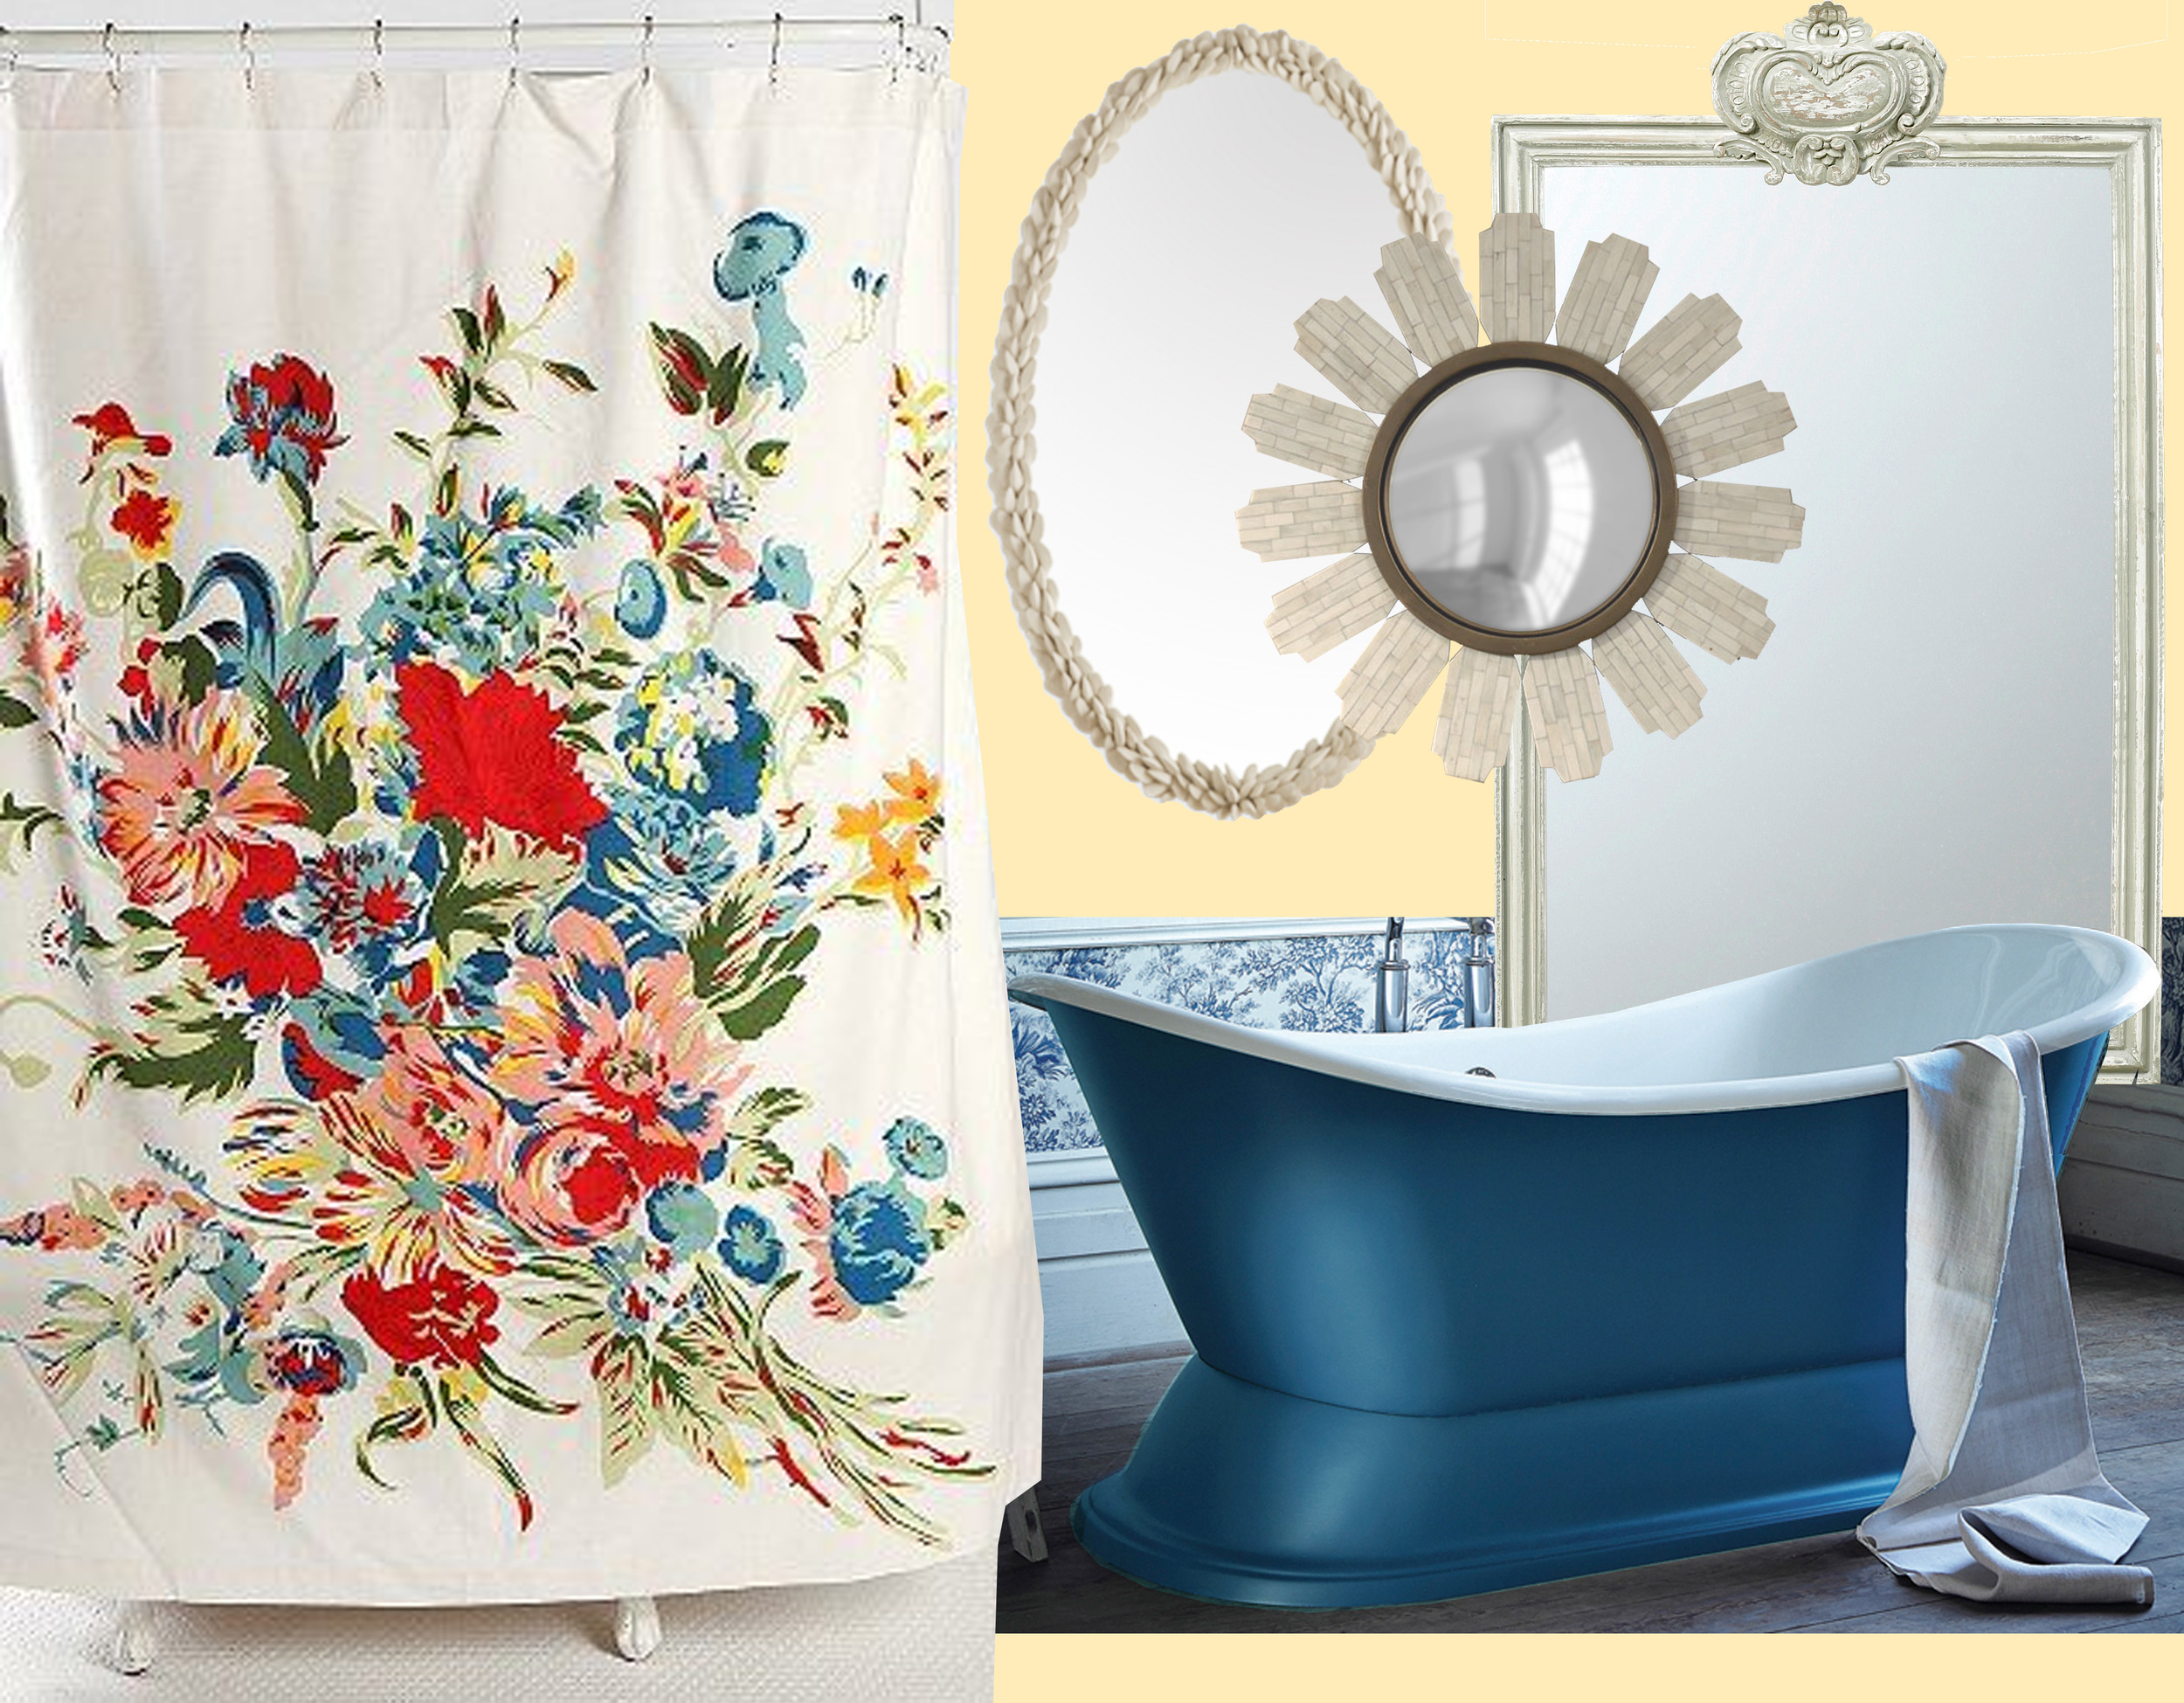 Floral scarf shower curtain  Urban Outfitters - bathtub  Albion  - Mussel-shell mirror  Porta Romana  - Lara mirror  Julian Chichester  - Sevres mirror  Mis en Demeure